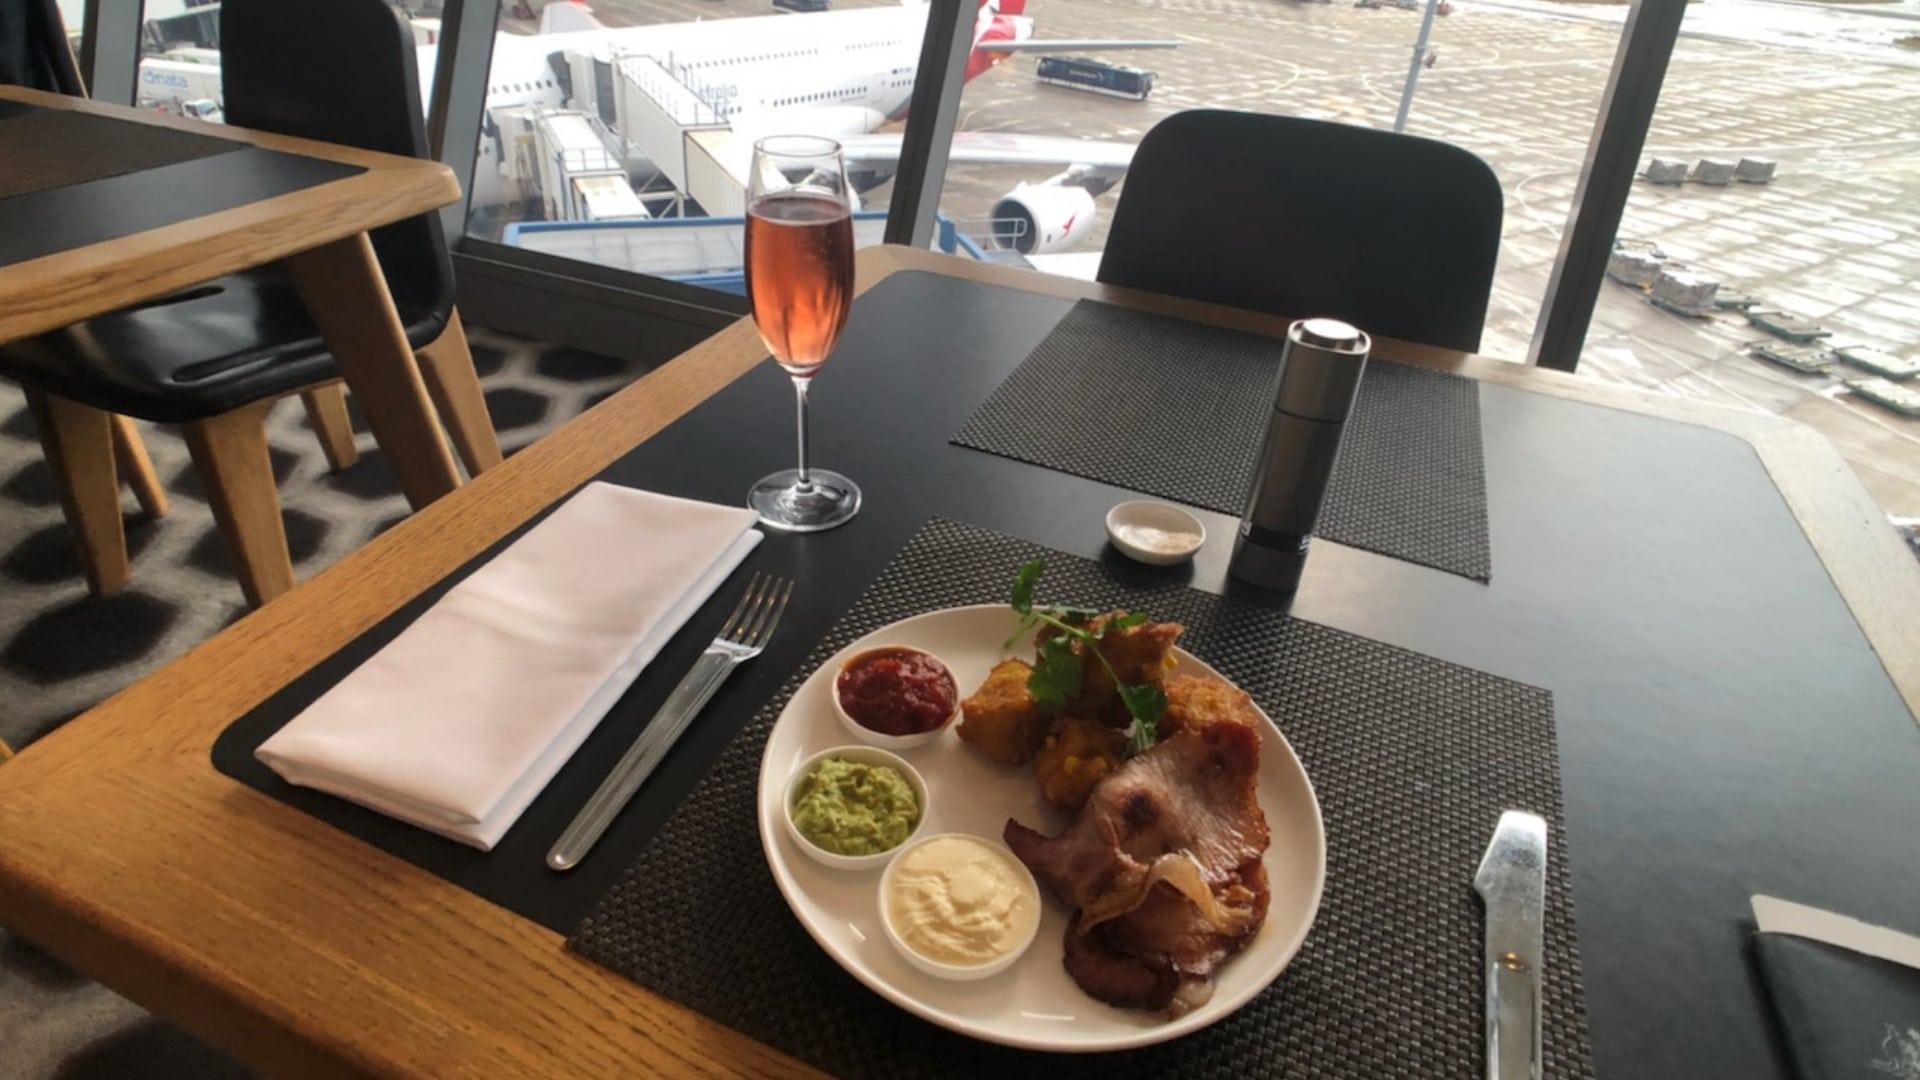 qantas first class lounge meal